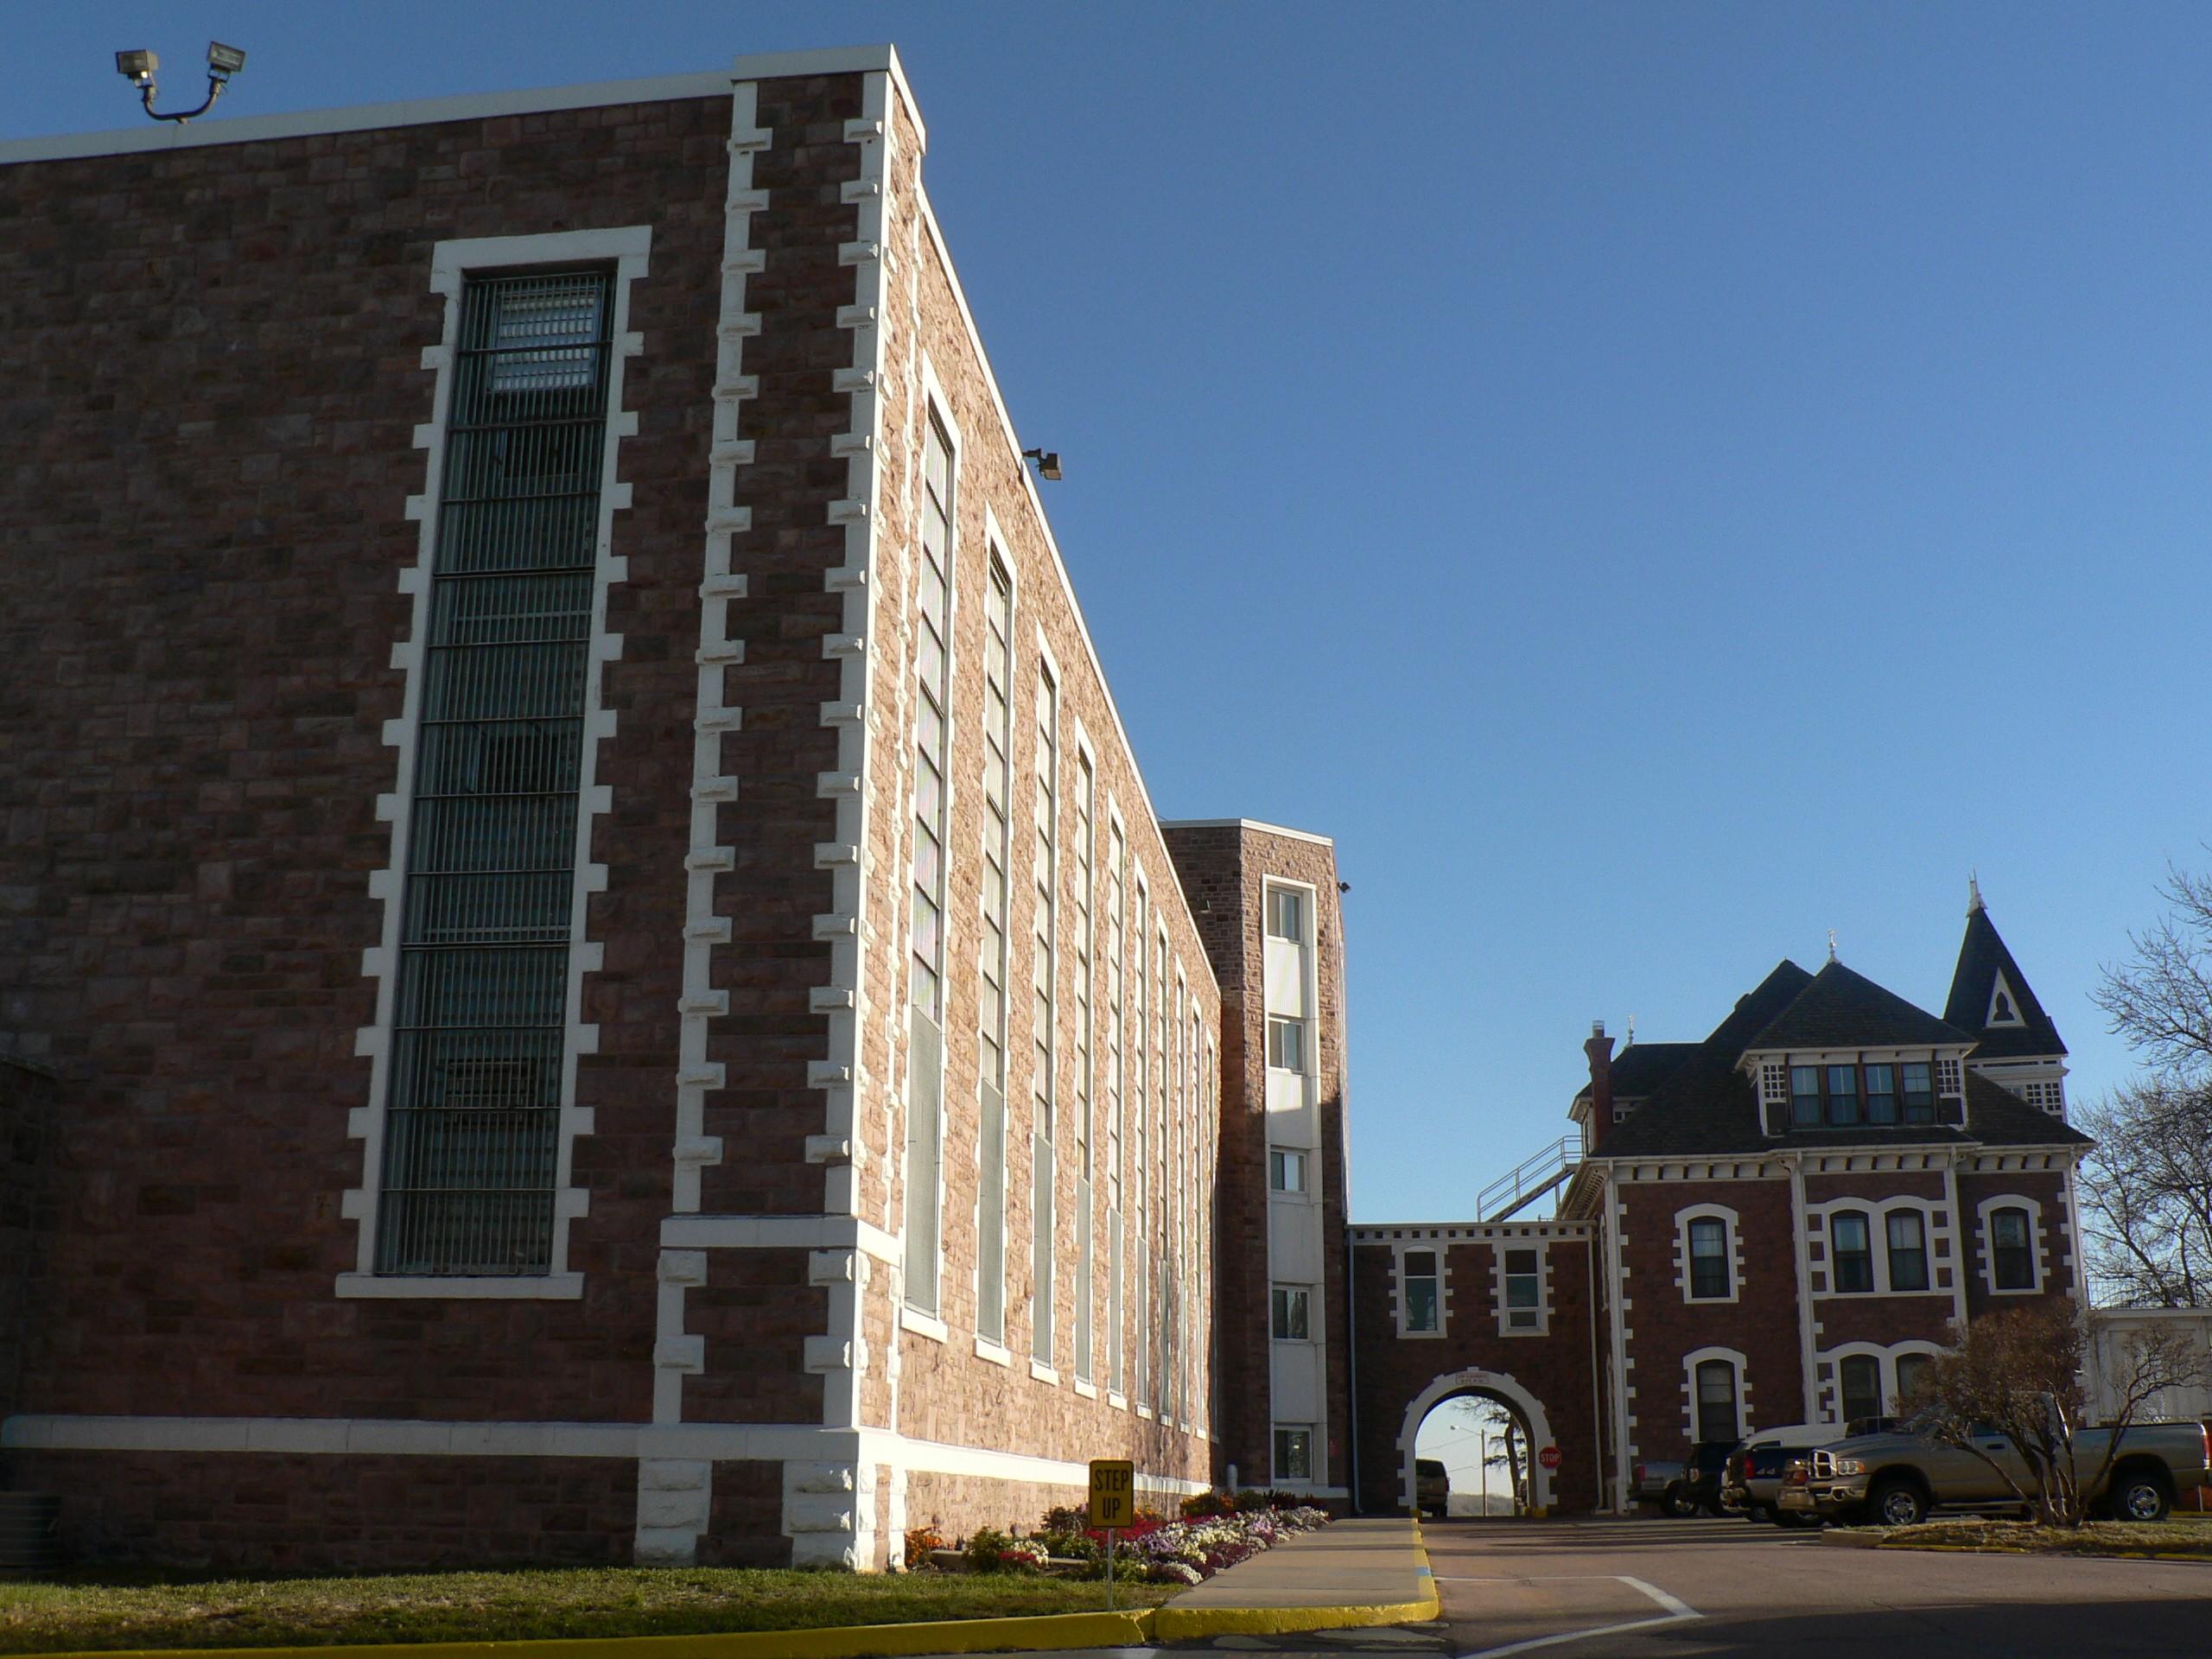 South Central Correctional Facility - TN.gov